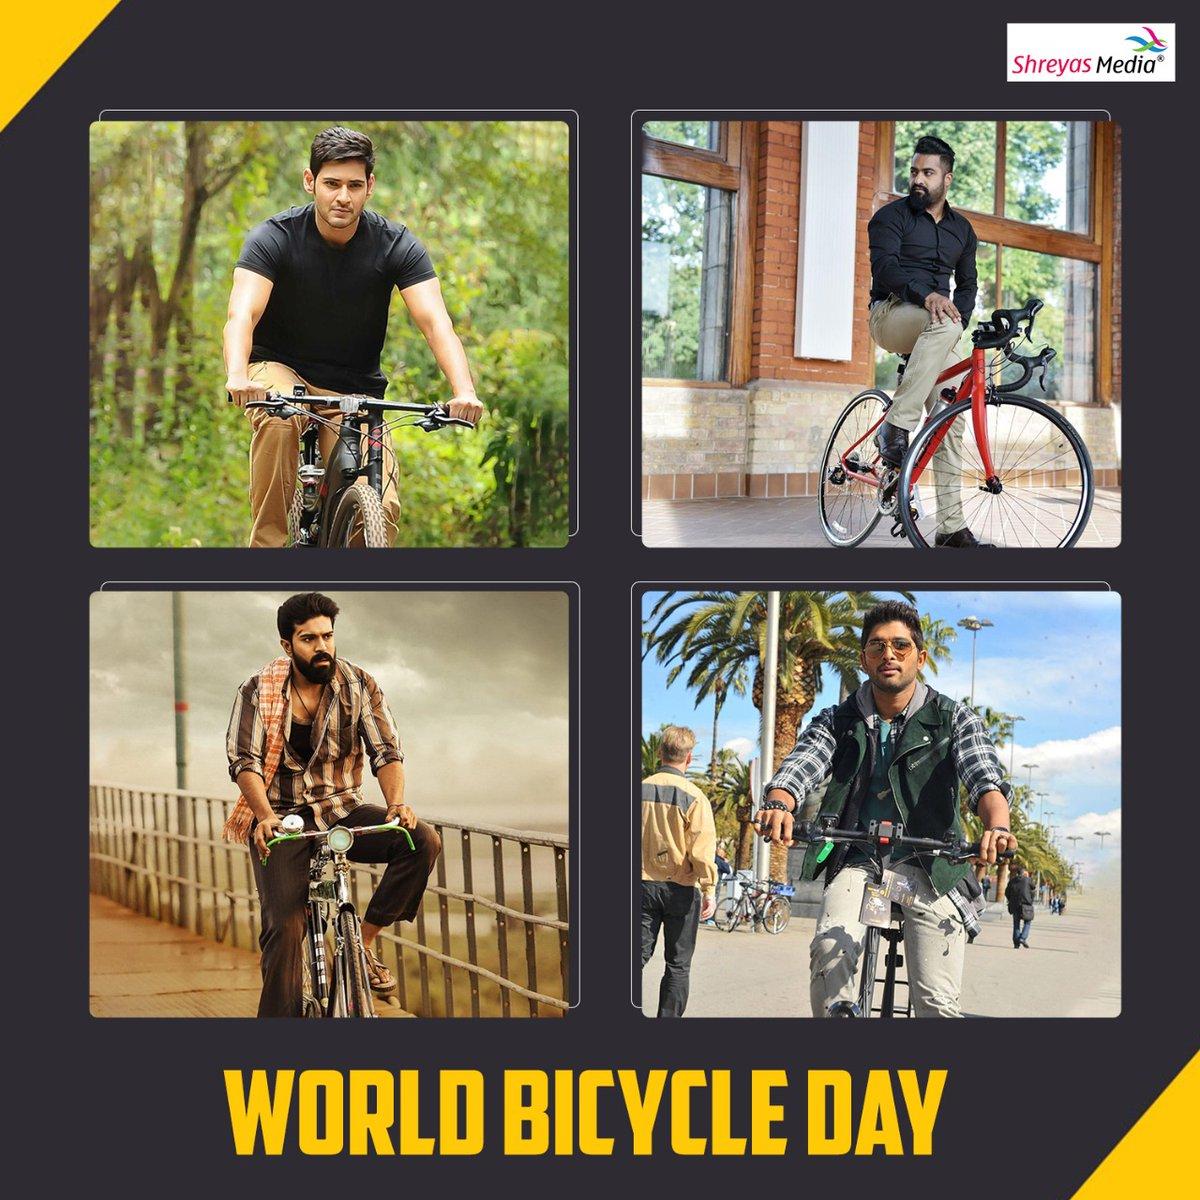 Its #WorldBicycleDay and we love these 4 looks of our stars!  #MaheshBabu #JrNTR #RamCharan #AlluArjun #ShreyasMedia https://t.co/zXHFj2iunp